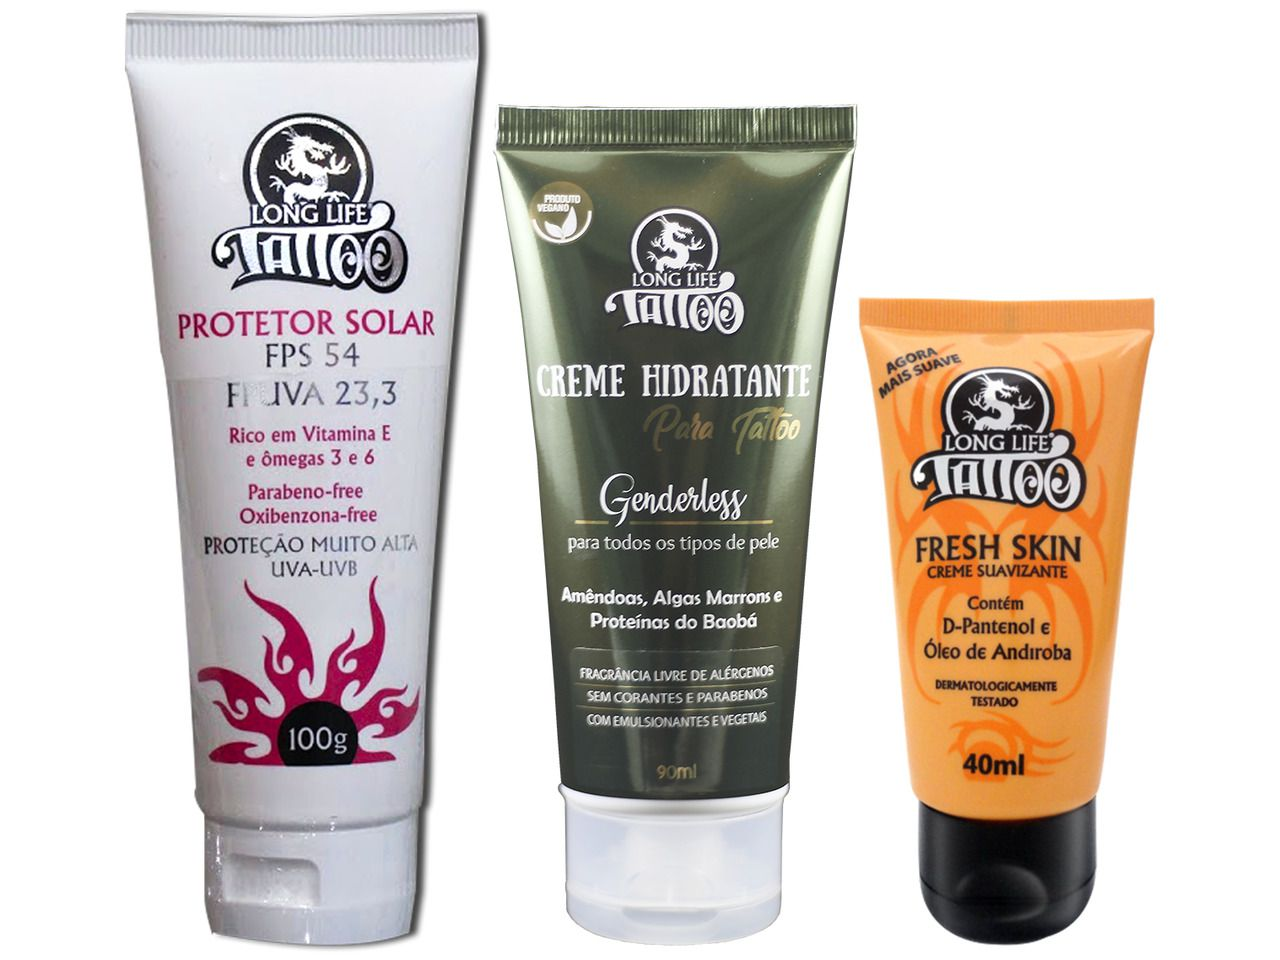 Kit de Cuidados (Fresh Skin Creme 40 ml + Hidratante para Tattoo Genderless + Protetor Solar FPS 54)